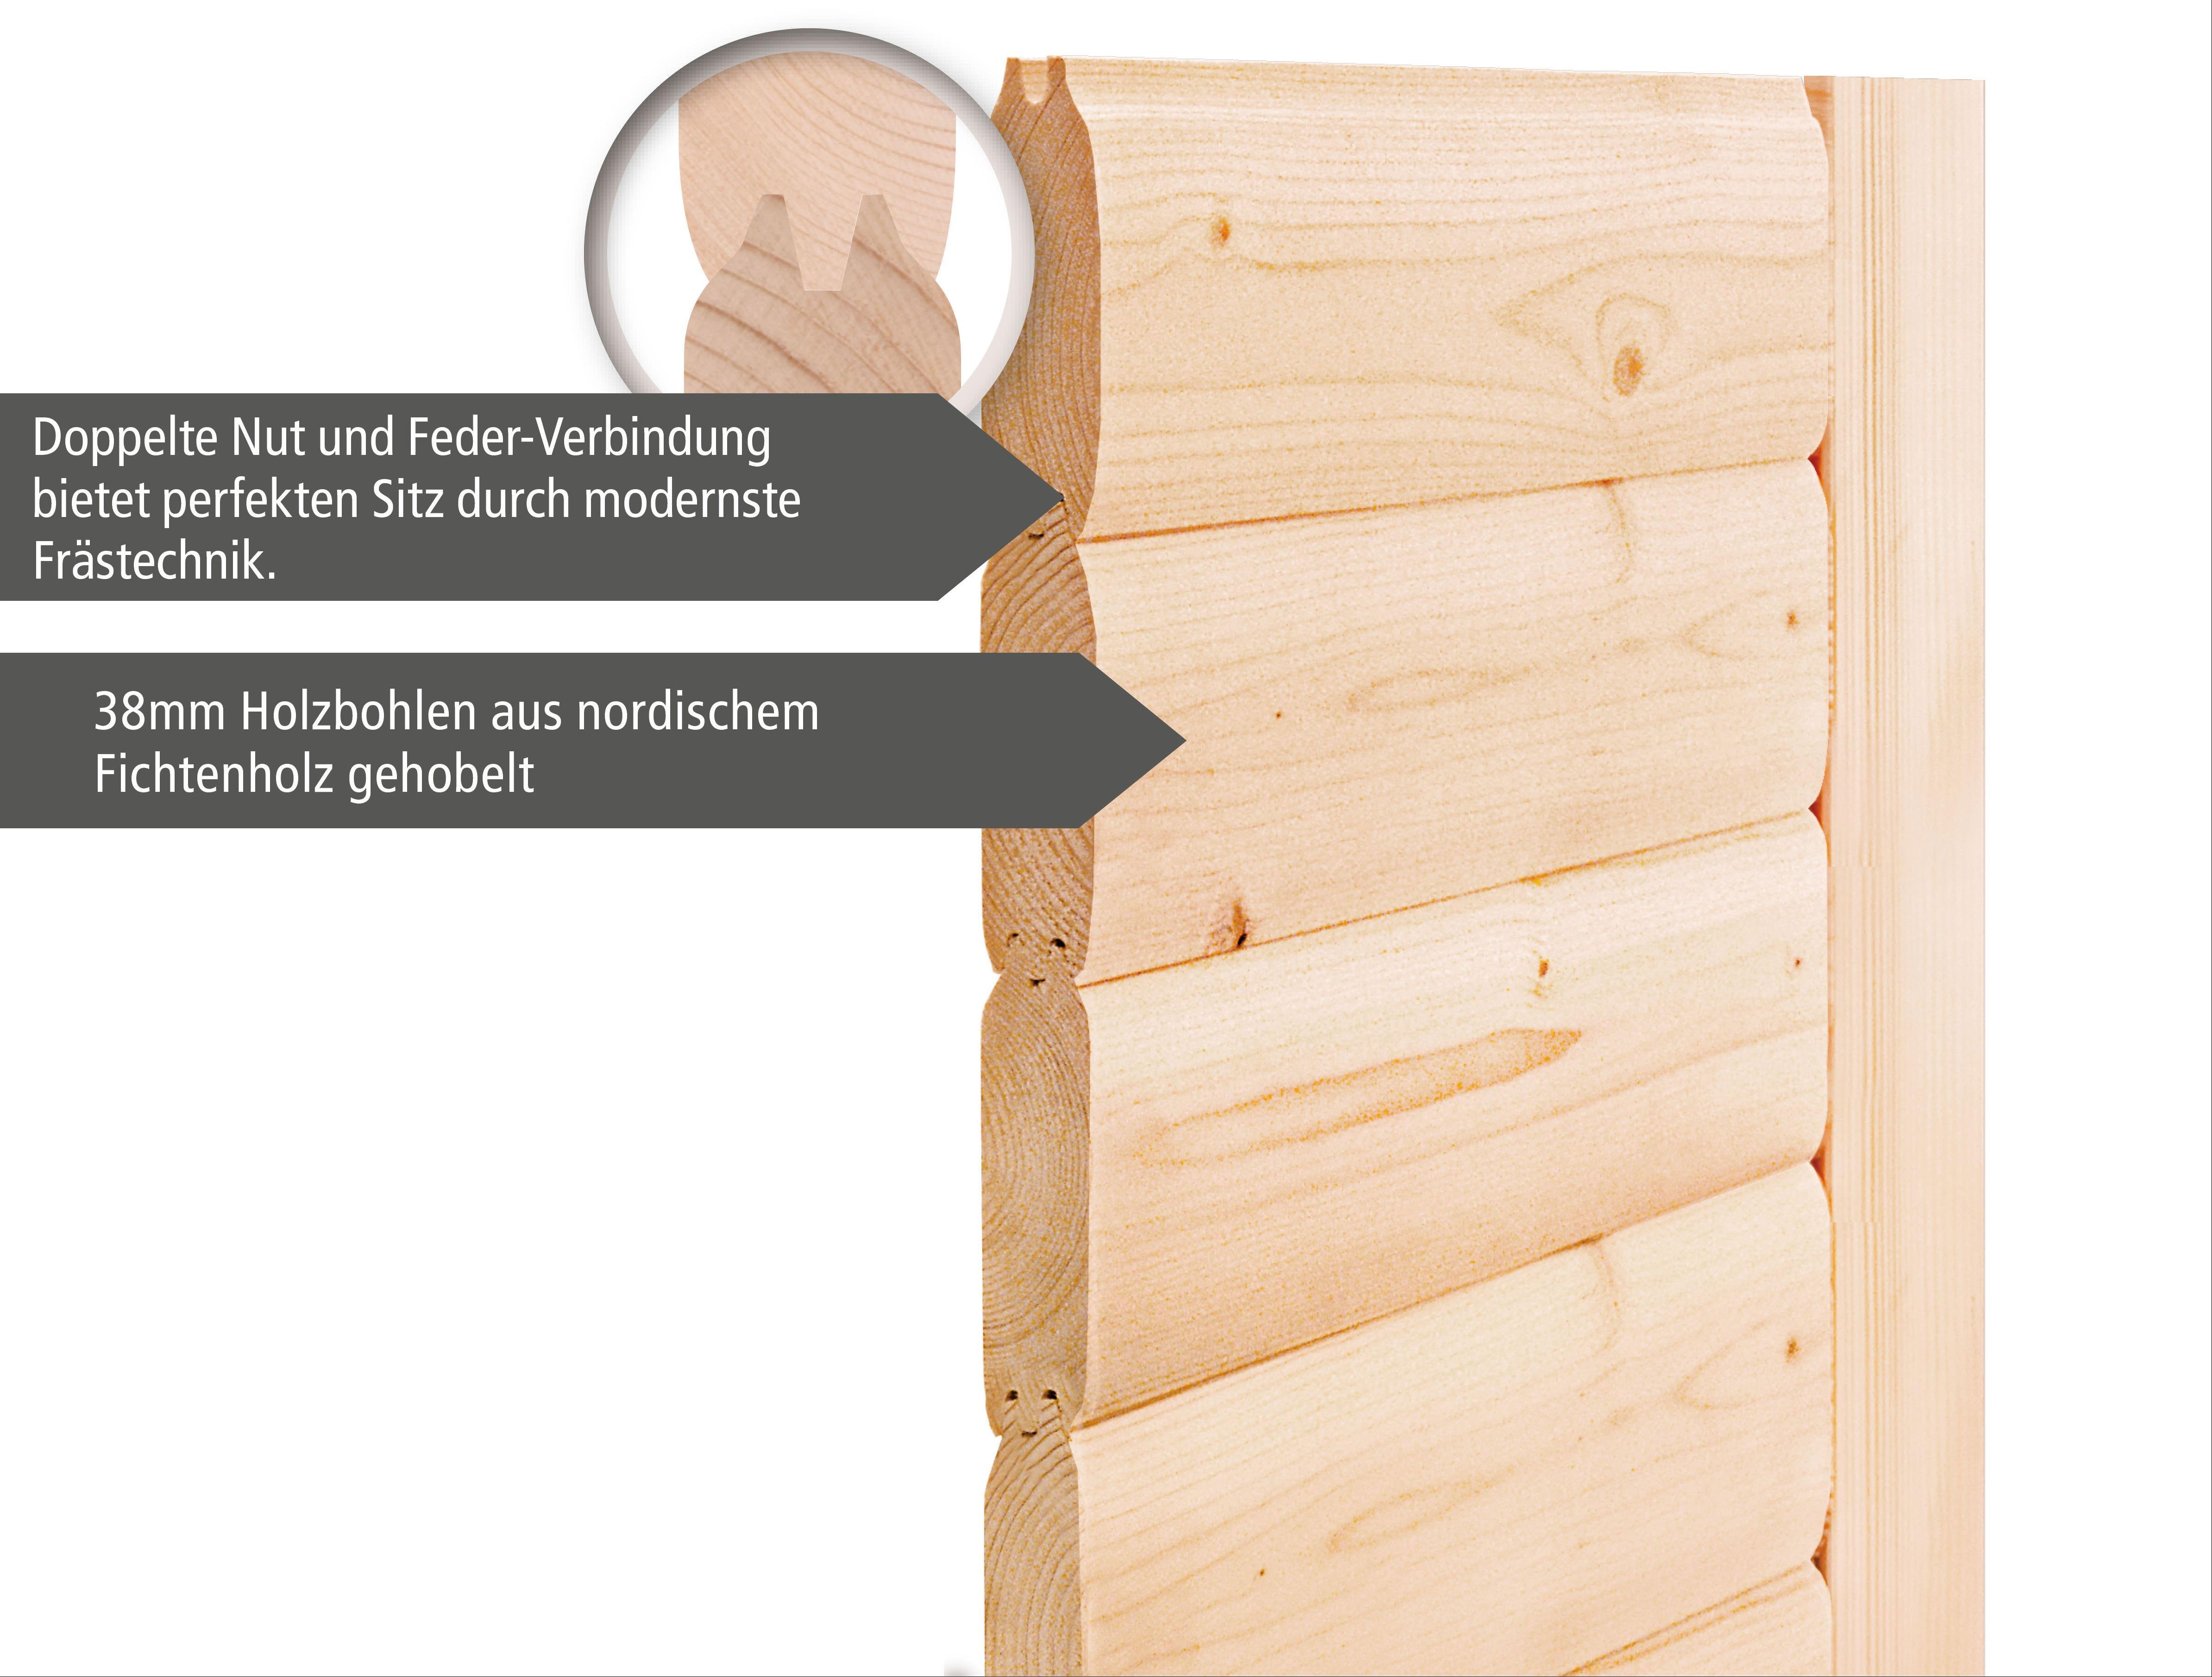 Woodfeeling Sauna Leona 38mm Kranz Ofen Bio 9kW Tür Classic Bild 6